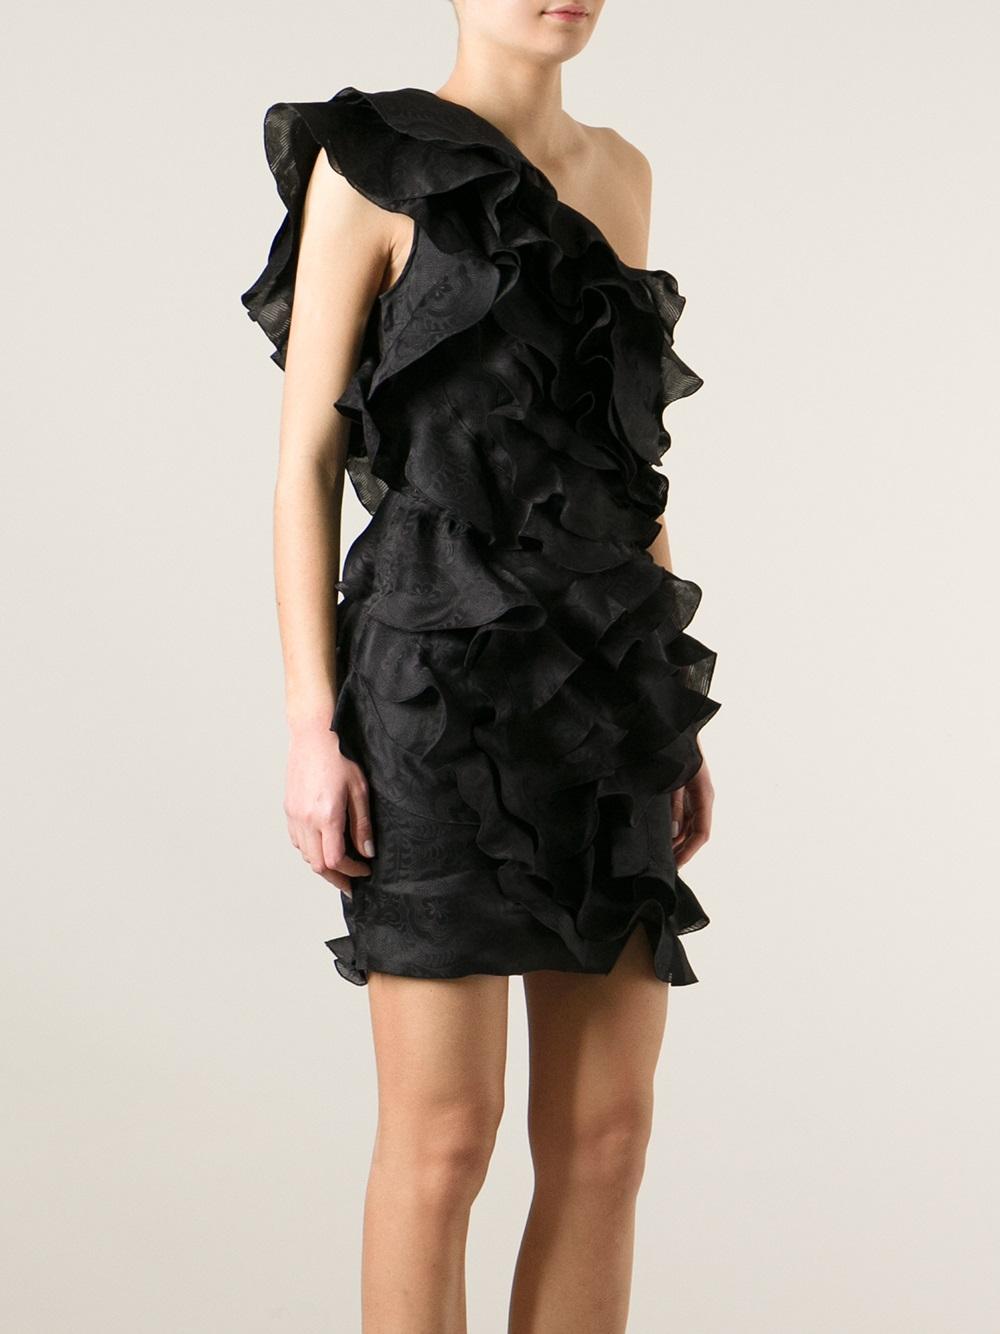 Isabel Marant ruffled one shoulder dress Amazon Cheap Online Cheap Price Original IfEW3wv